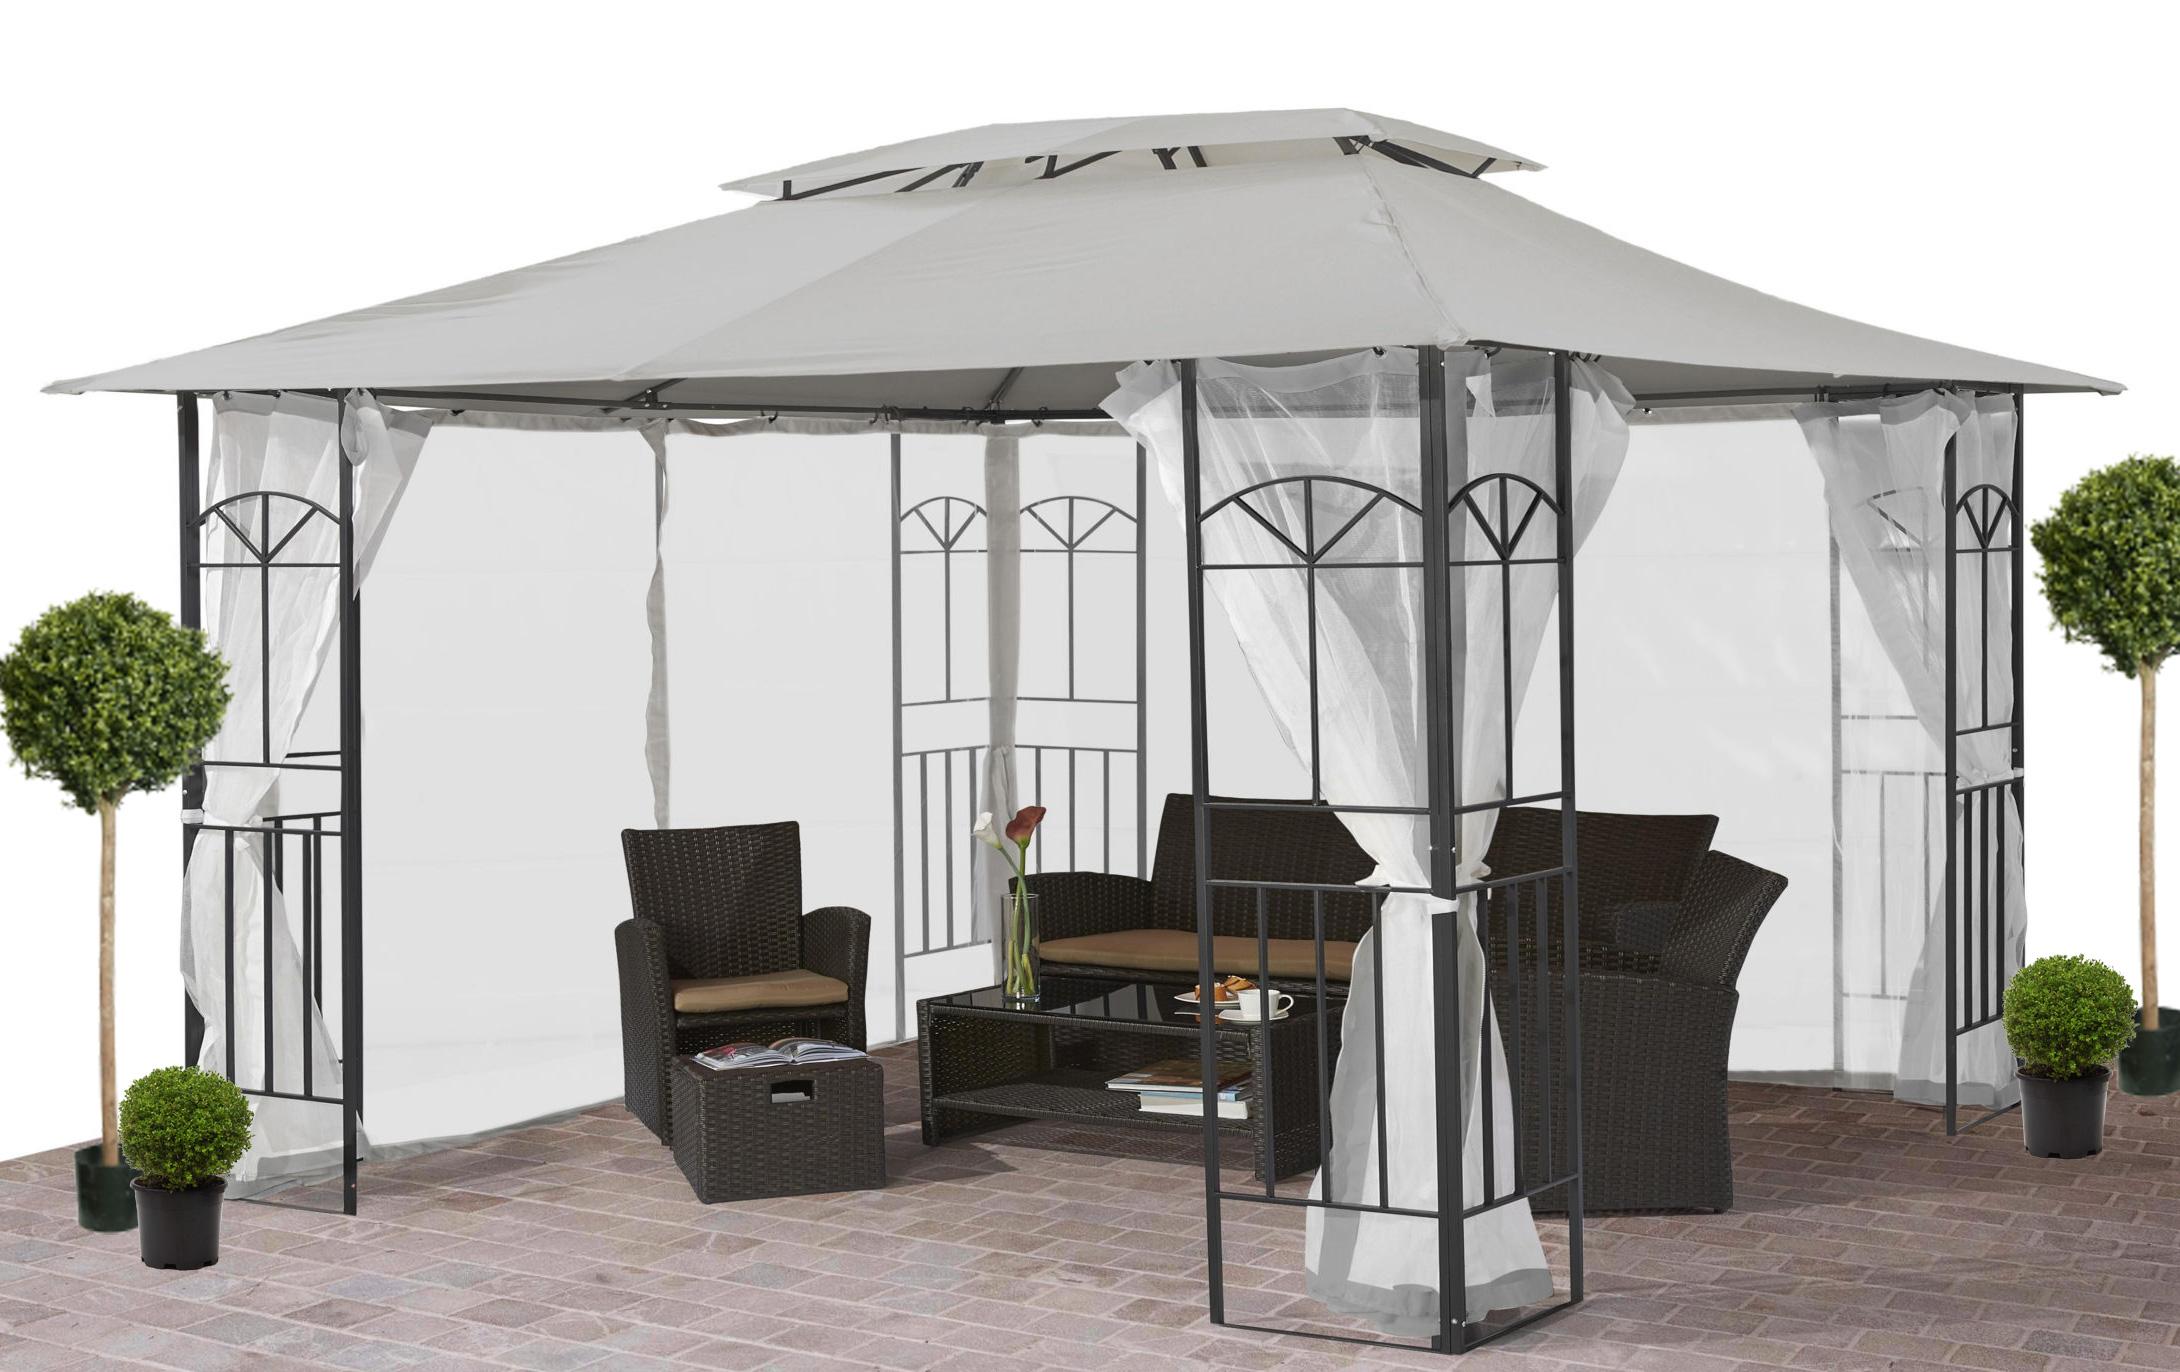 pavillon stahl gestell 3x4 doppeldach polyester hellgrau 7220069 ebay. Black Bedroom Furniture Sets. Home Design Ideas